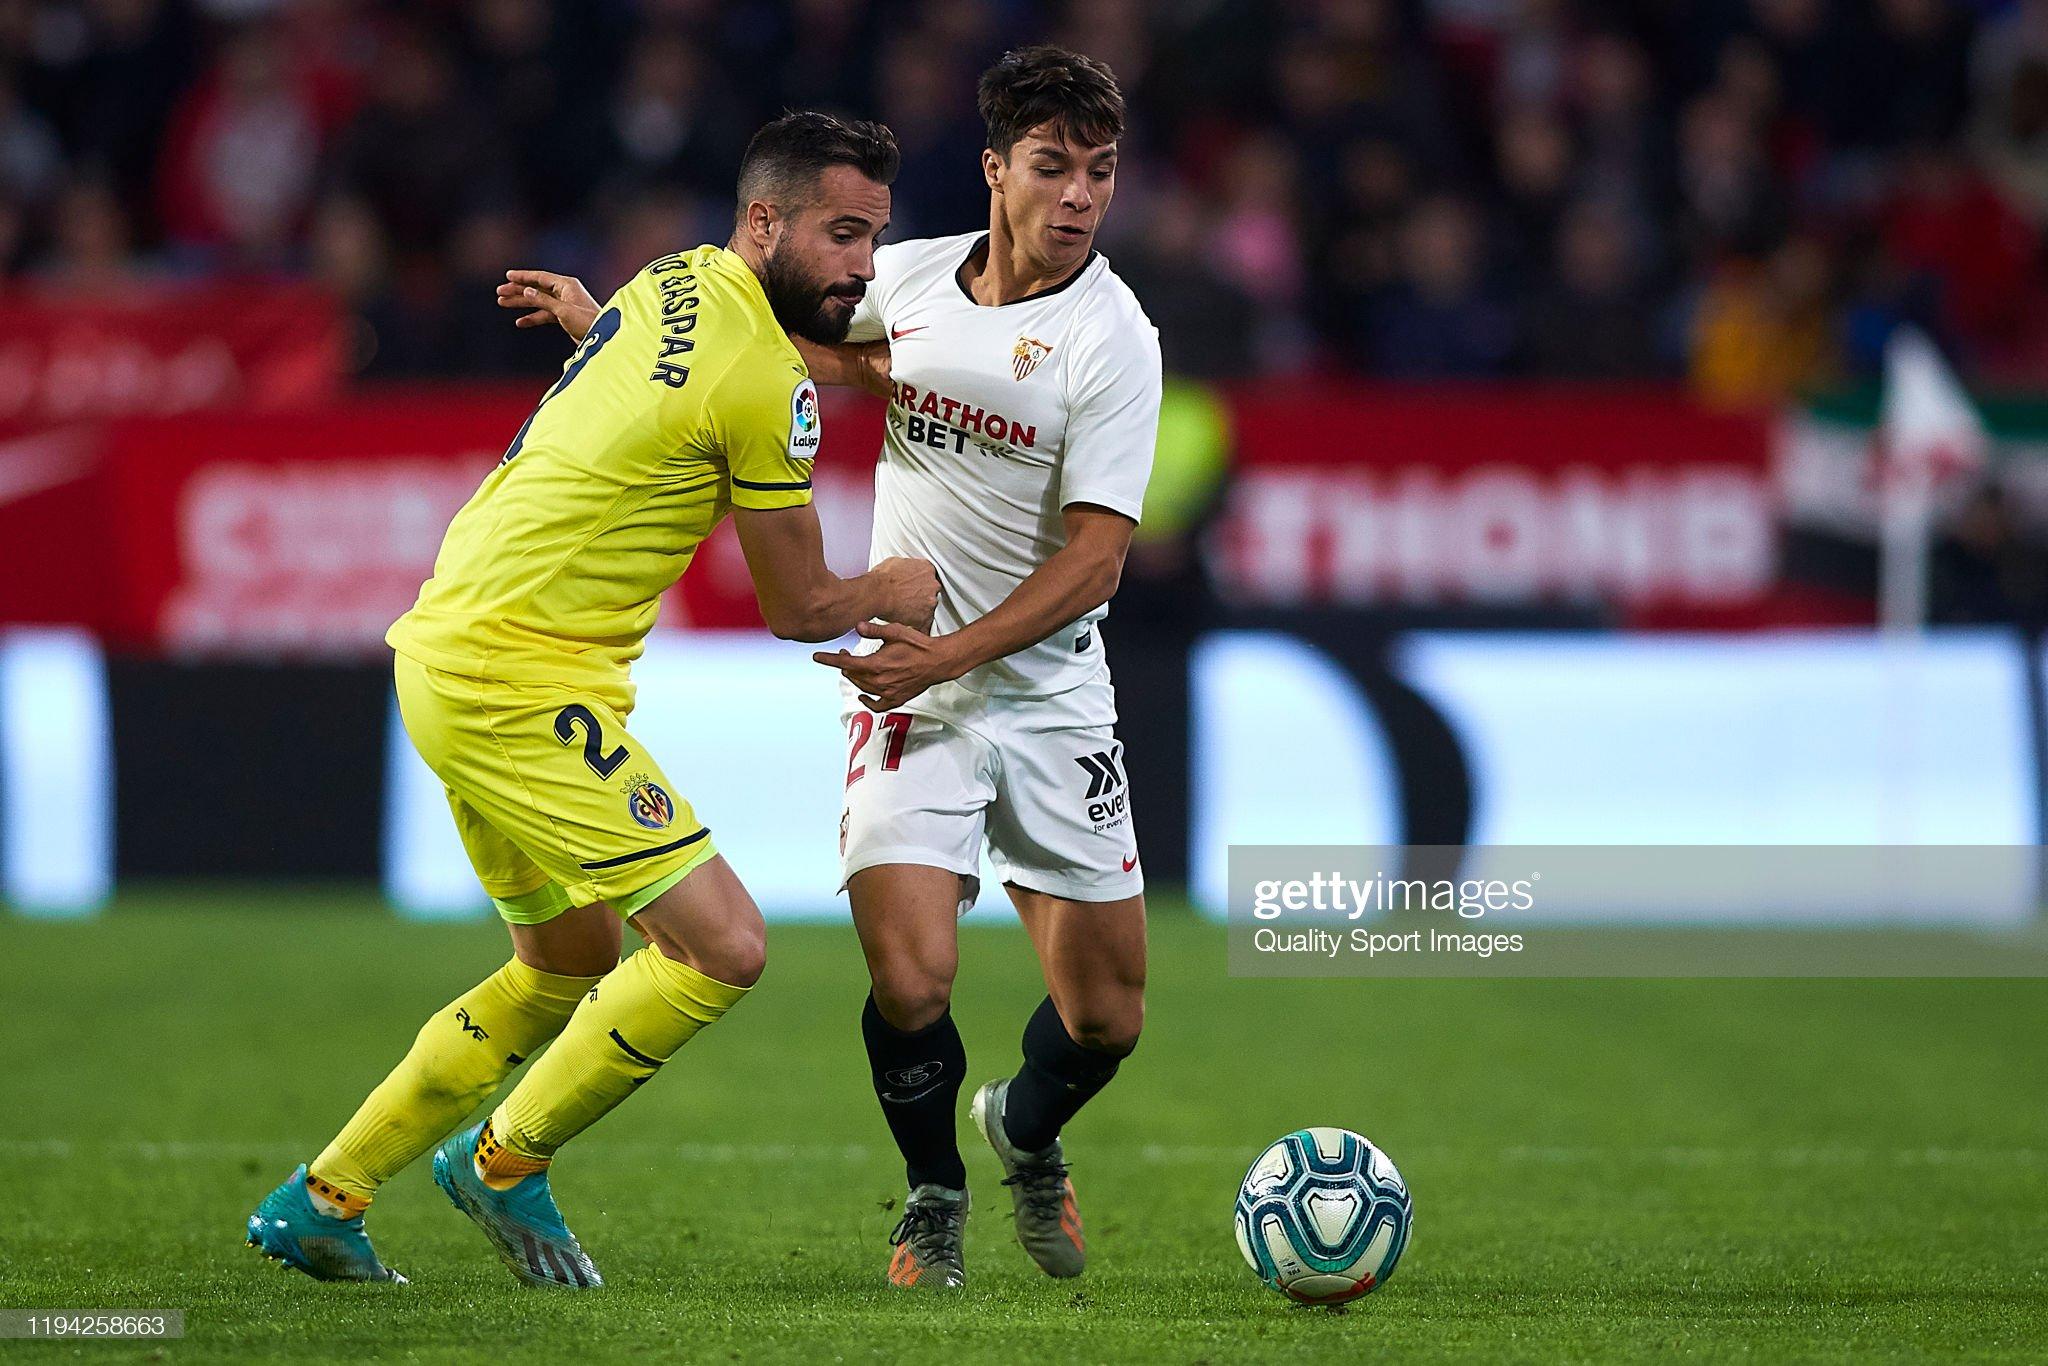 Villarreal vs Sevilla Preview, prediction and odds